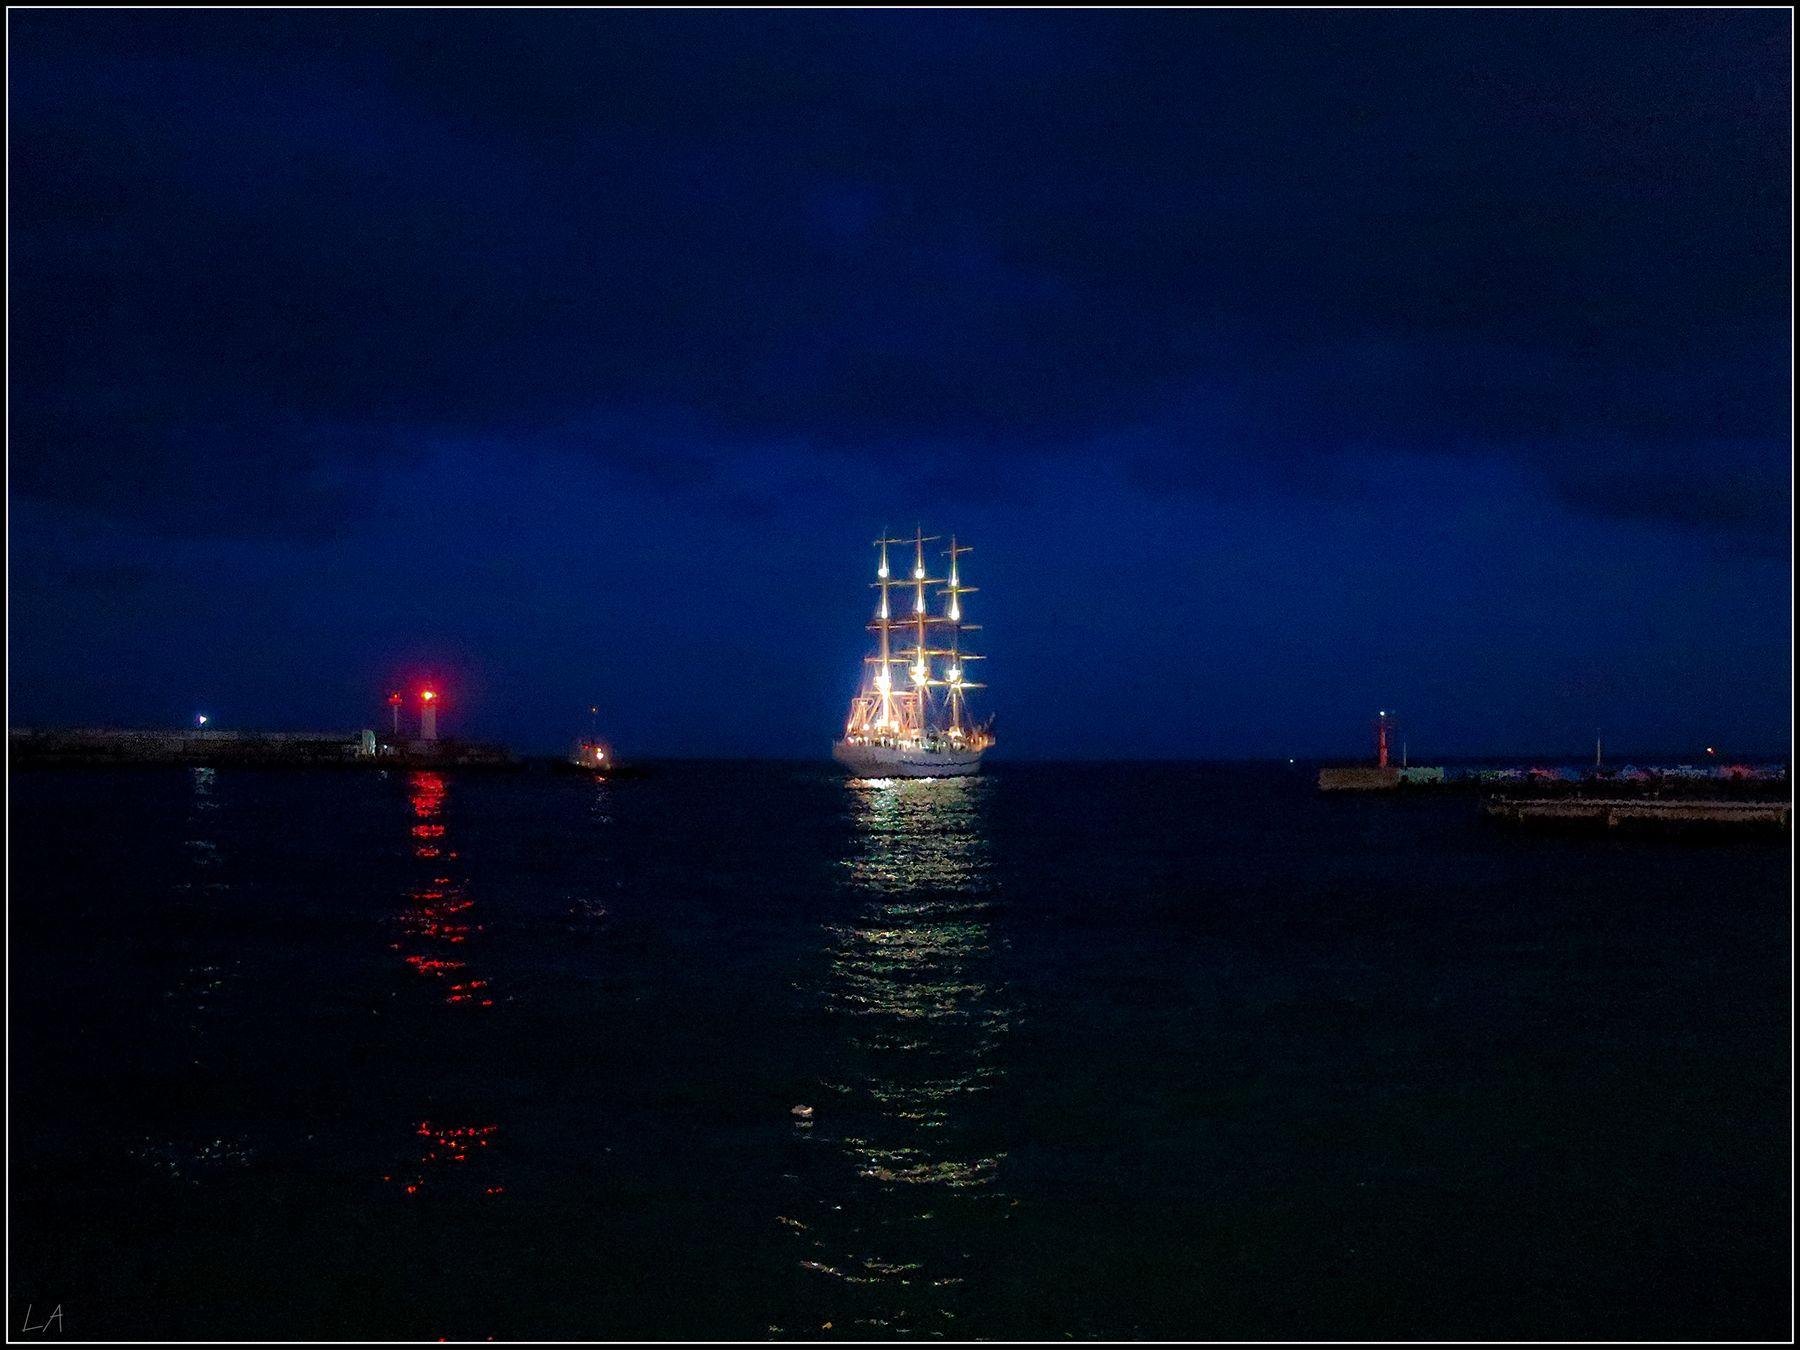 *Баллада о морском страннике* фотография путешествия Крым парусник Ялта вечер море Фото.Сайт Photo.Sight Светлана Мамакина Lihgra Adventure